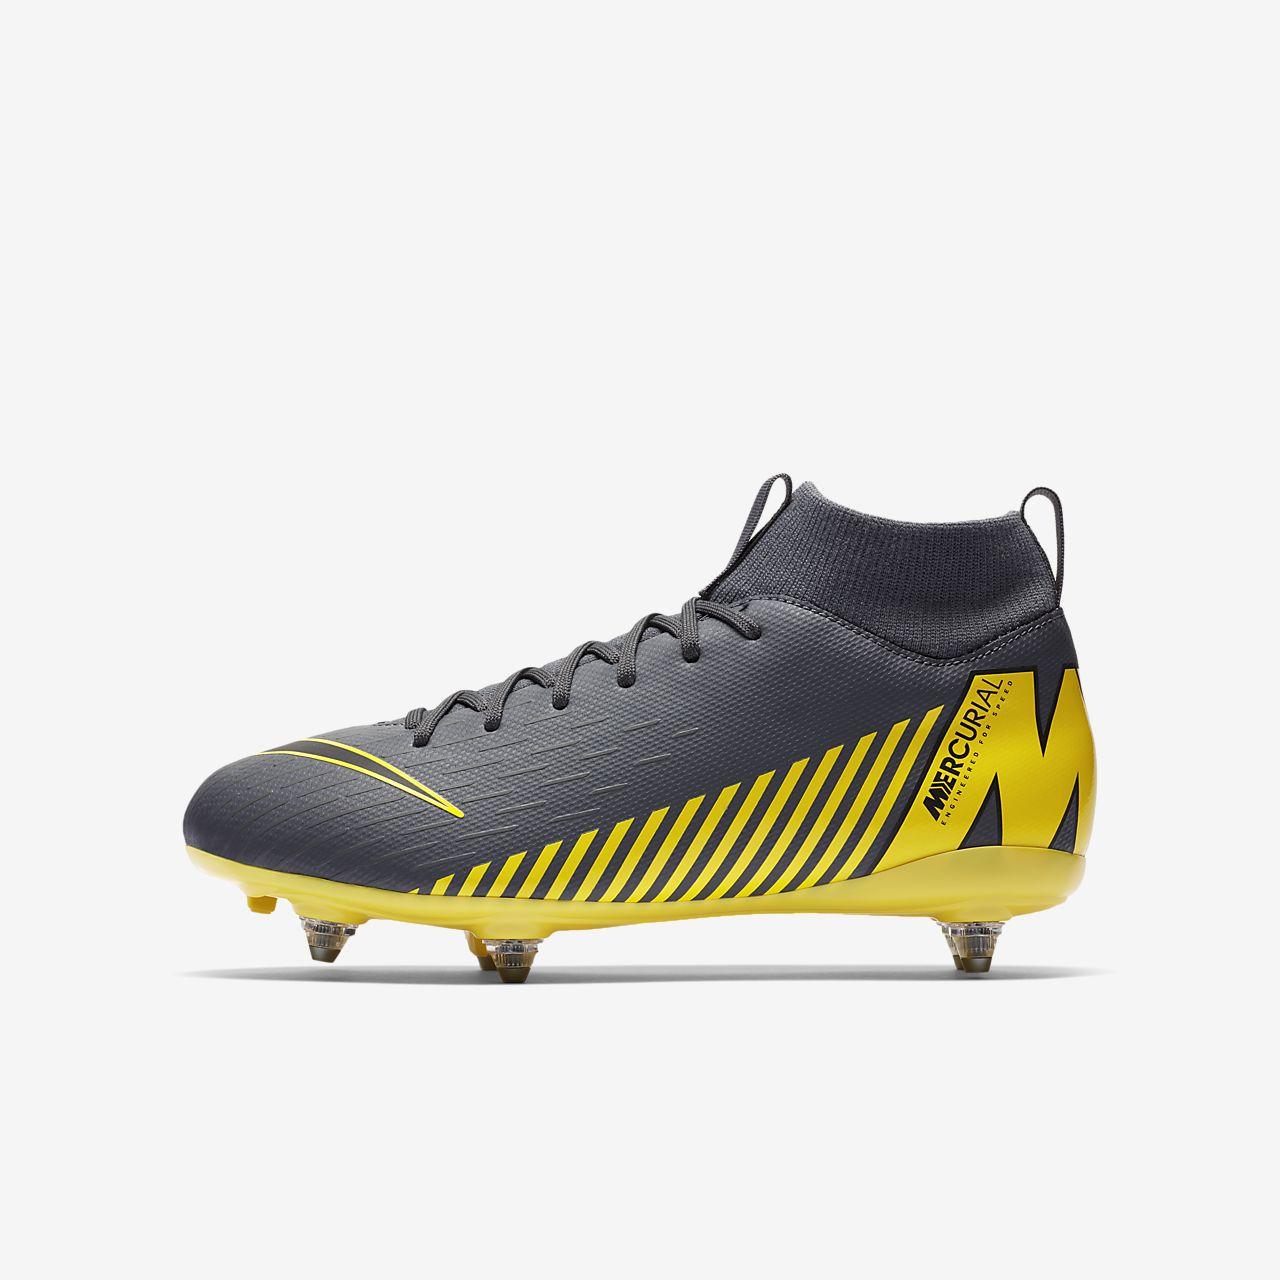 53d411b009 ... Chaussure de football à crampons pour terrain gras Nike Jr. Mercurial  Superfly VI Academy SG